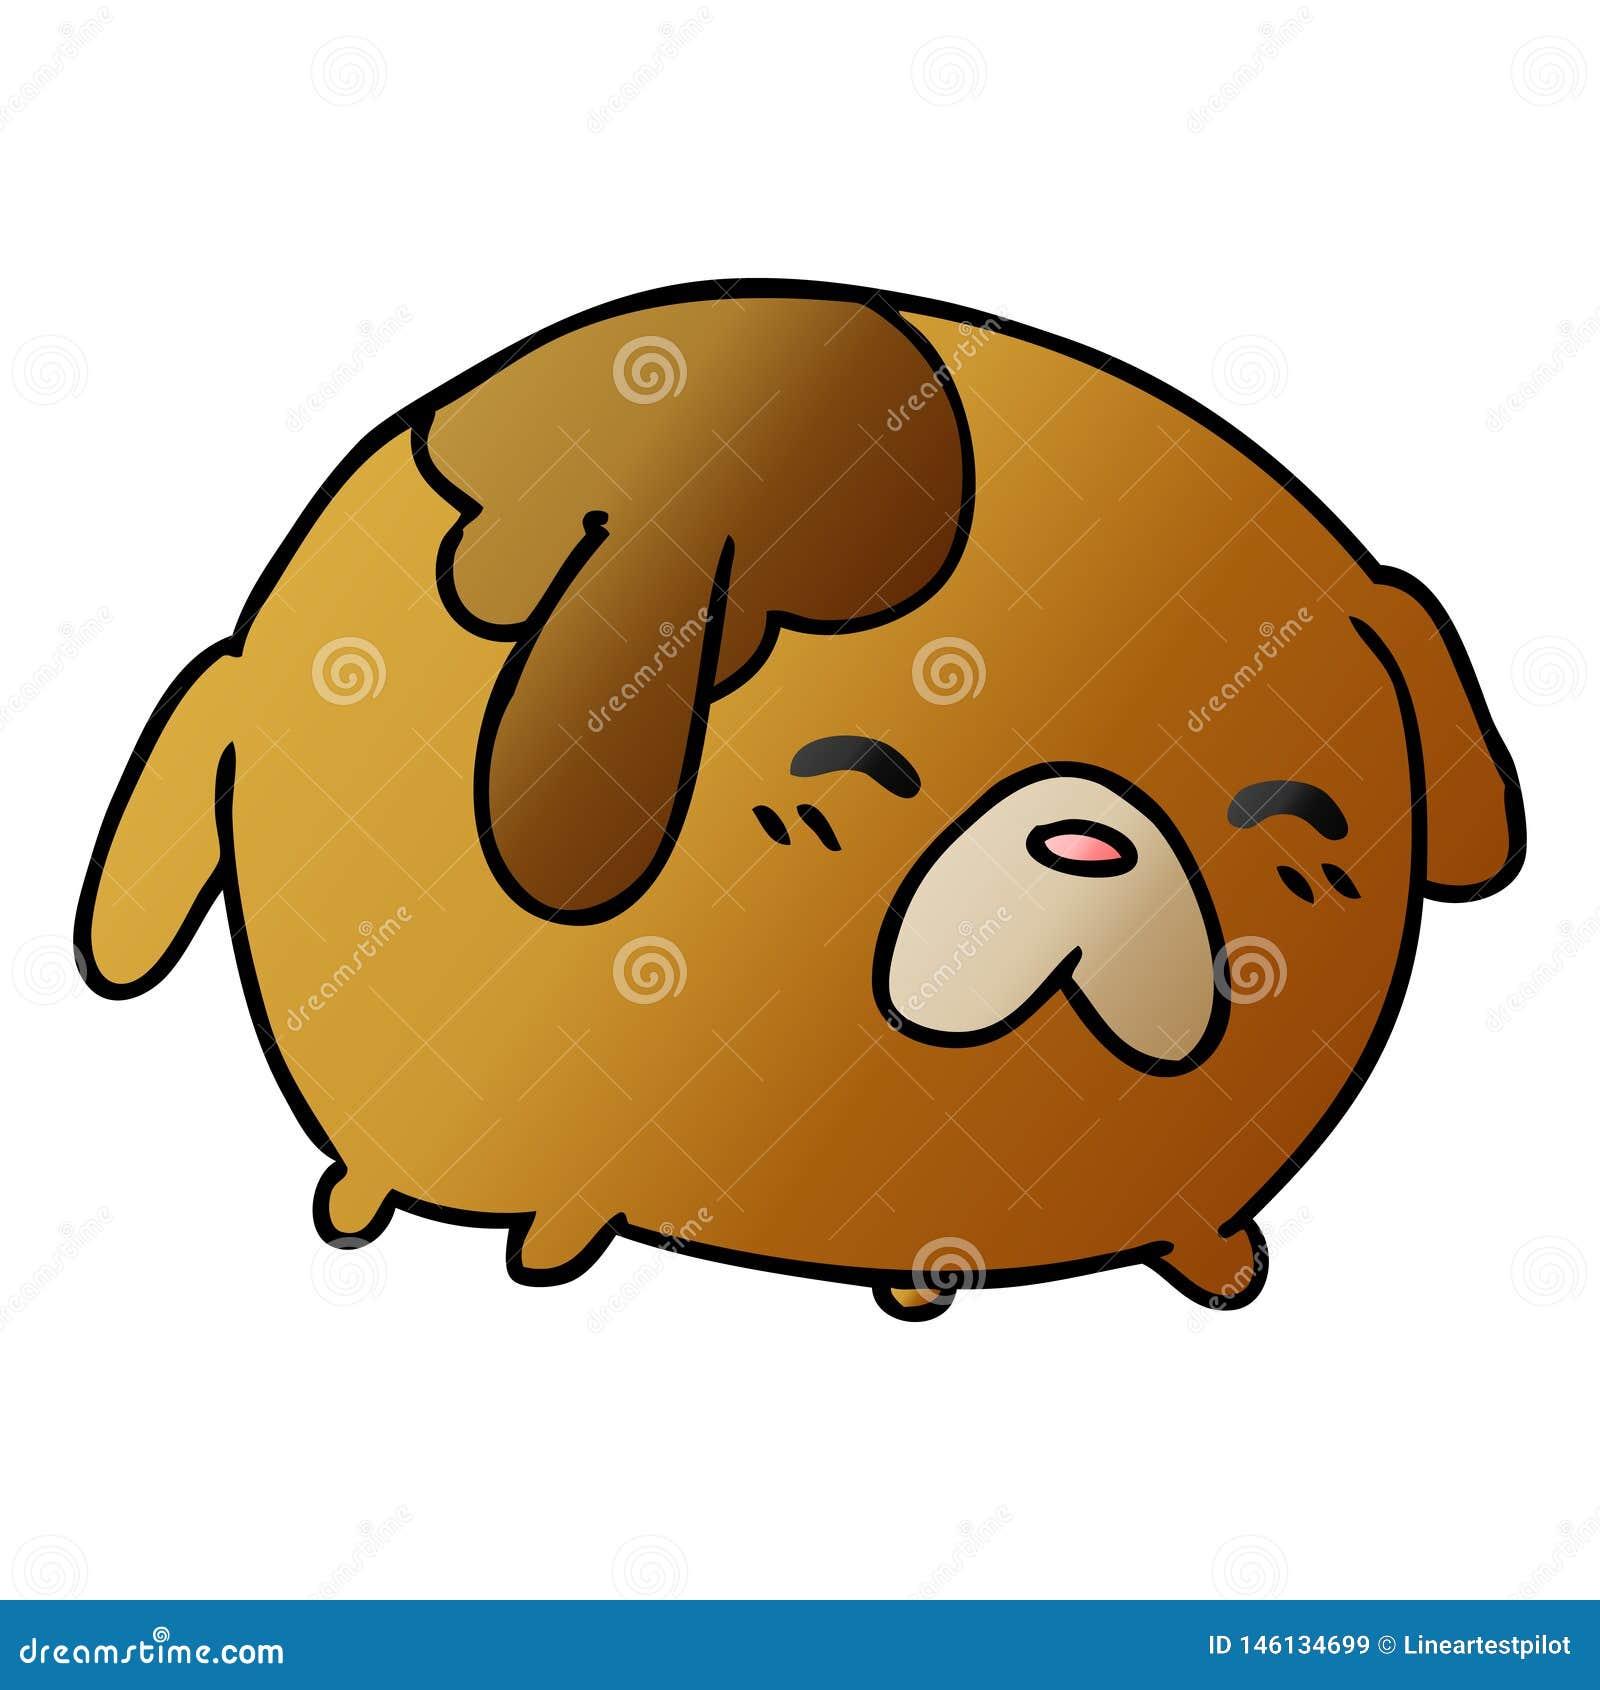 Gradient Cartoon Kawaii Cute Dog Animal Pet Art Artwork Illustration Doodle Drawing Quirky Funny Fun Freehand Free Hand Drawn Stock Illustrations 12 Gradient Cartoon Kawaii Cute Dog Animal Pet Art Artwork